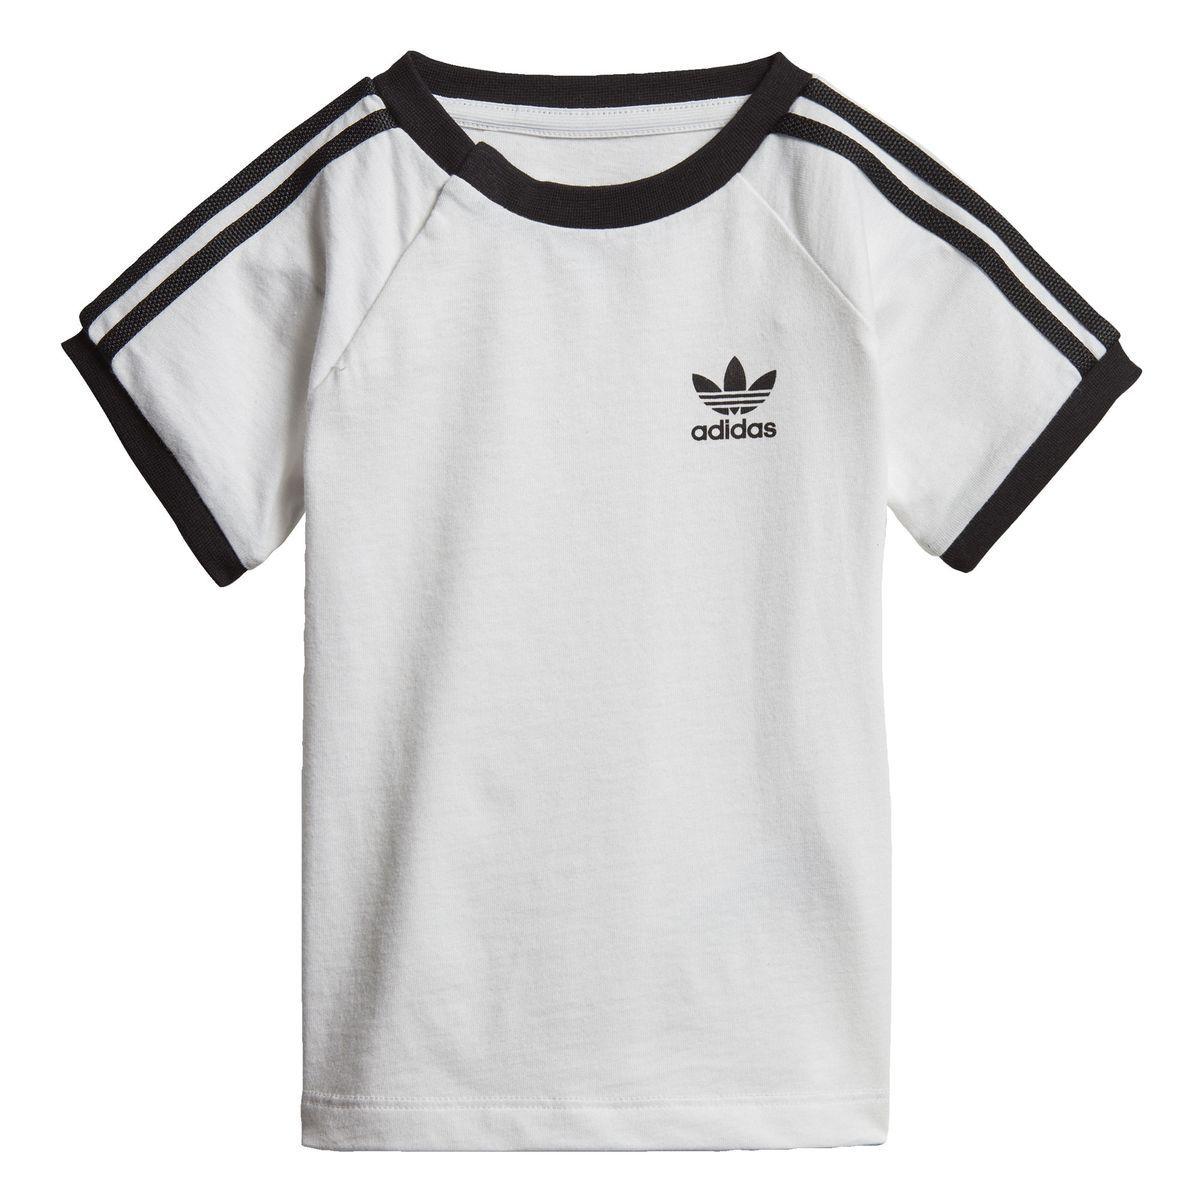 tee shirt garcon 12 ans adidas